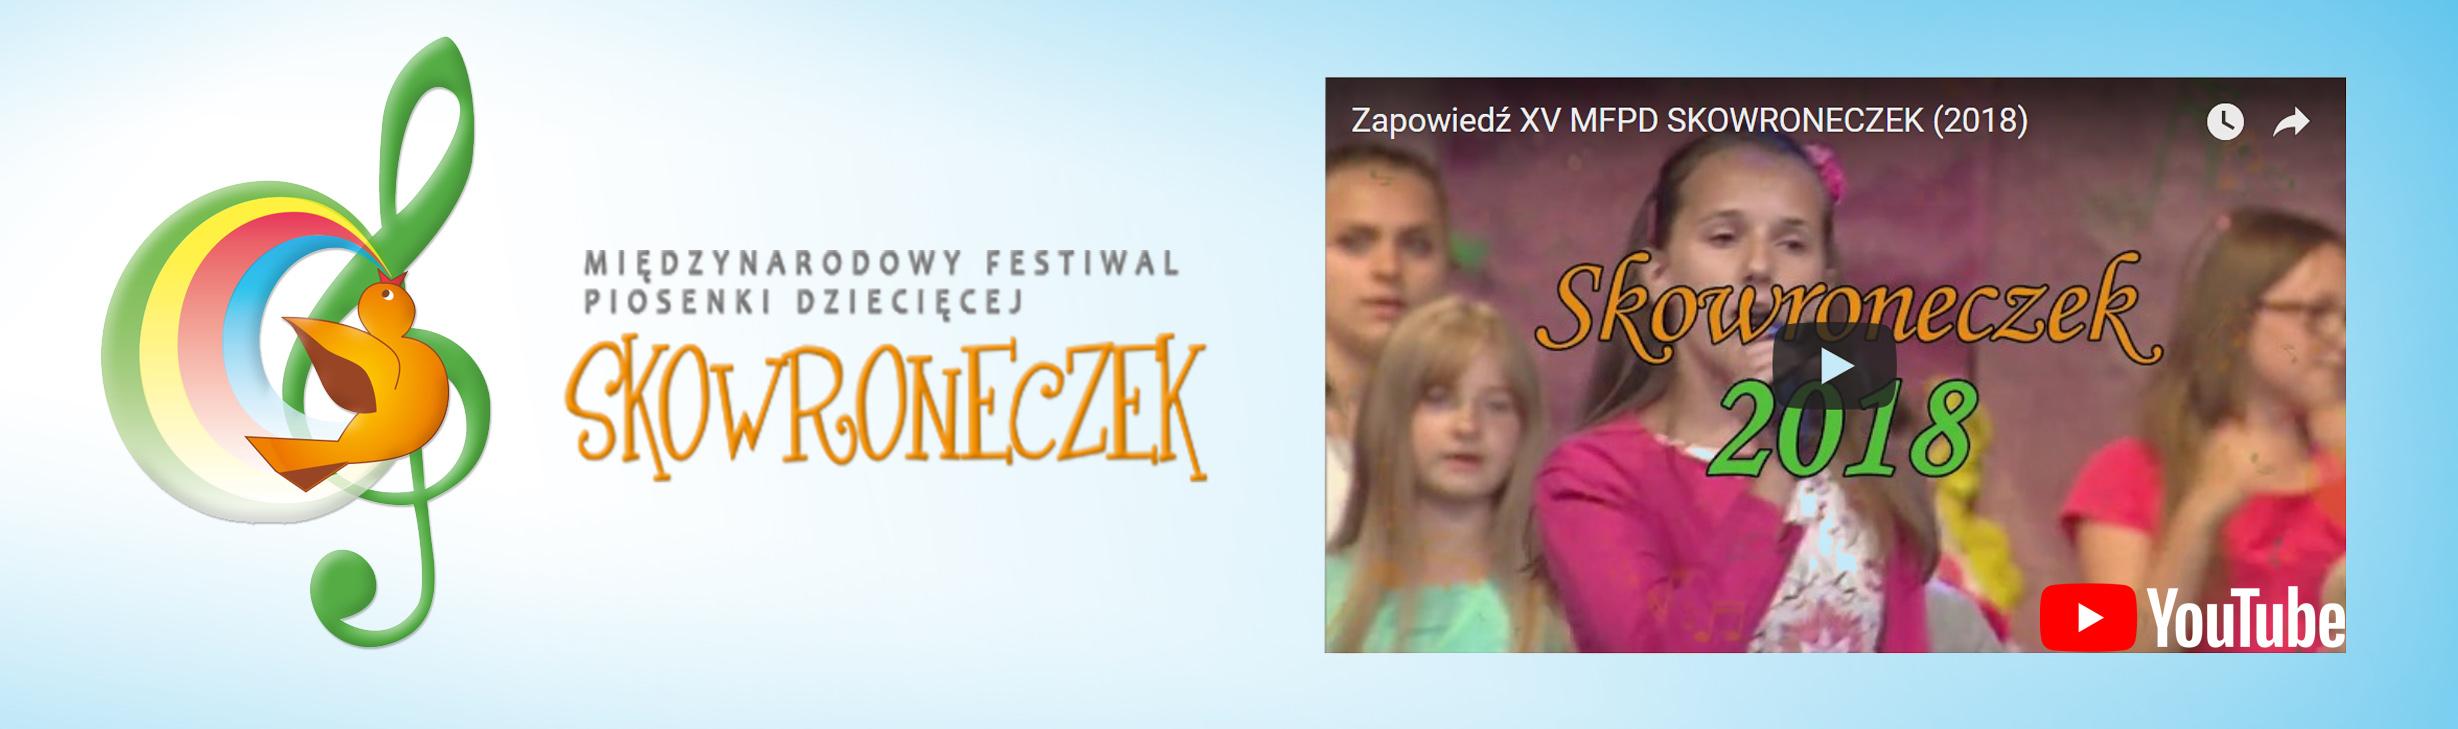 Zaproszenie_Skowroneczek_2018_YT